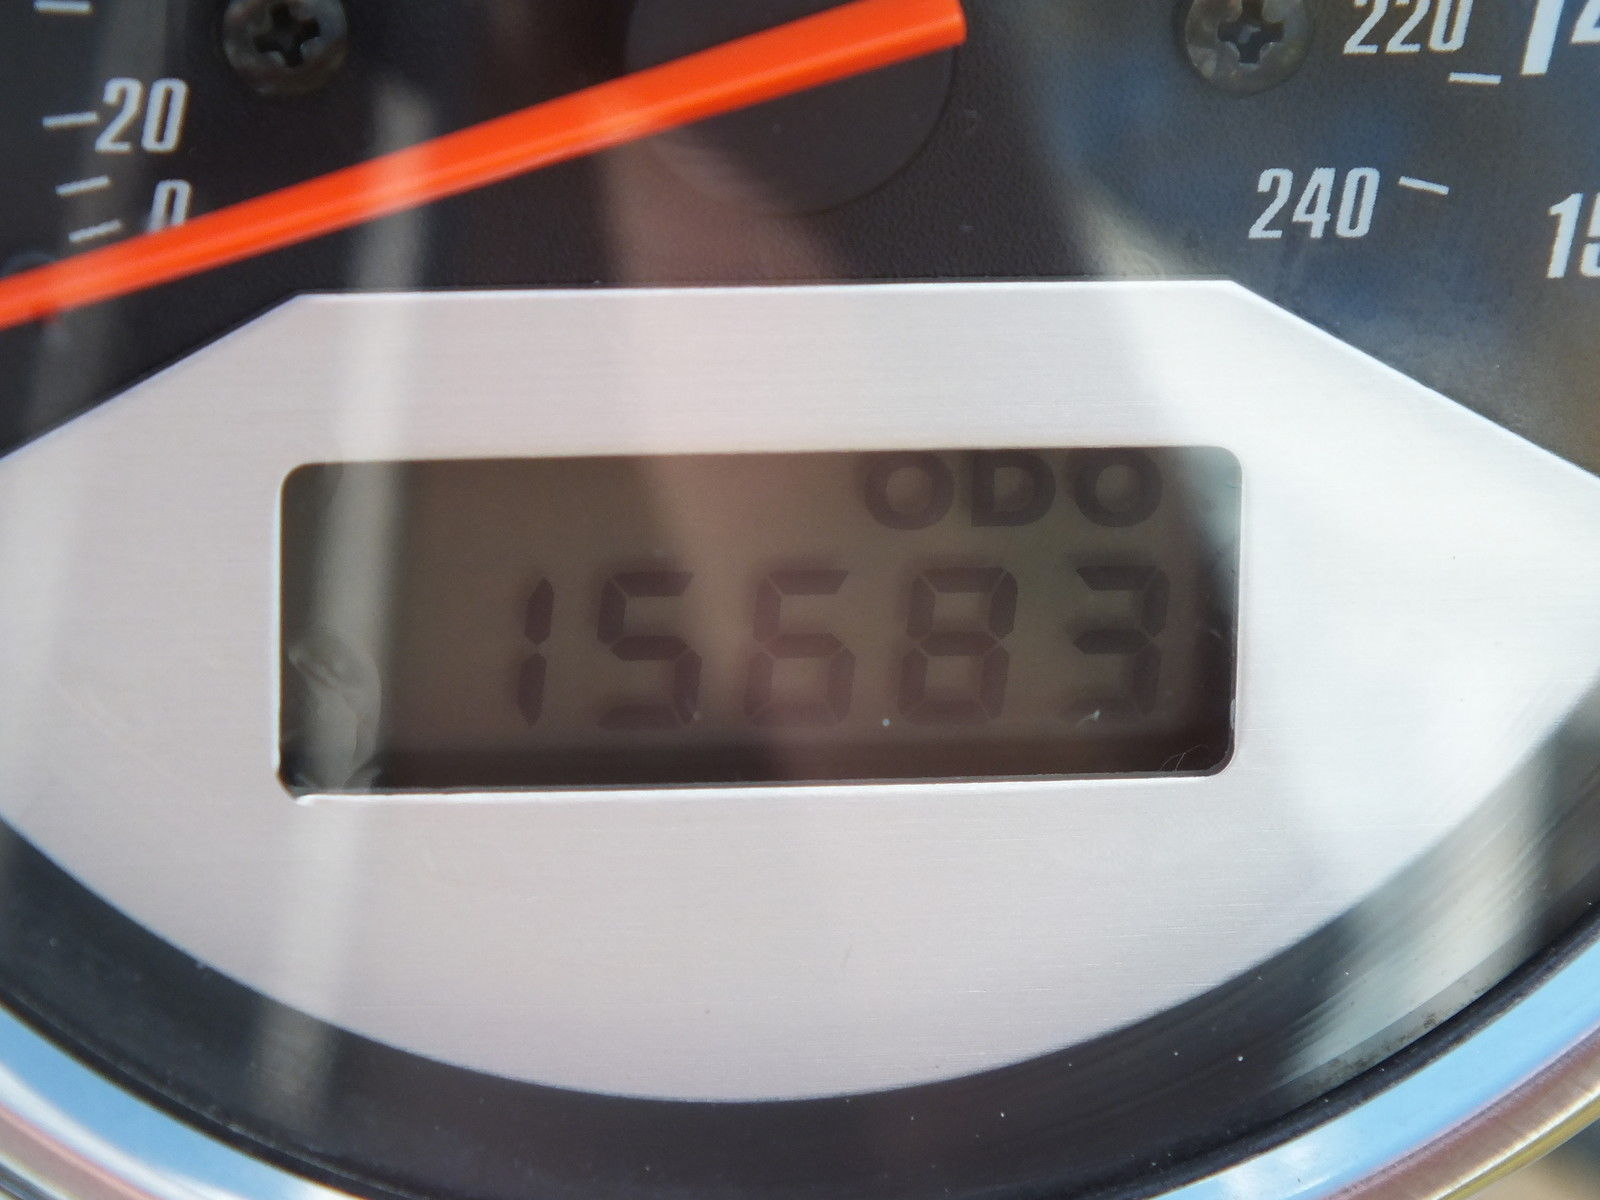 2002 Honda Vtx Wiring Diagram Page 3 And Schematics 1800c Suzuki Intruder 1500 Fuse Box Diagrams Data Base 1800 Vacuum